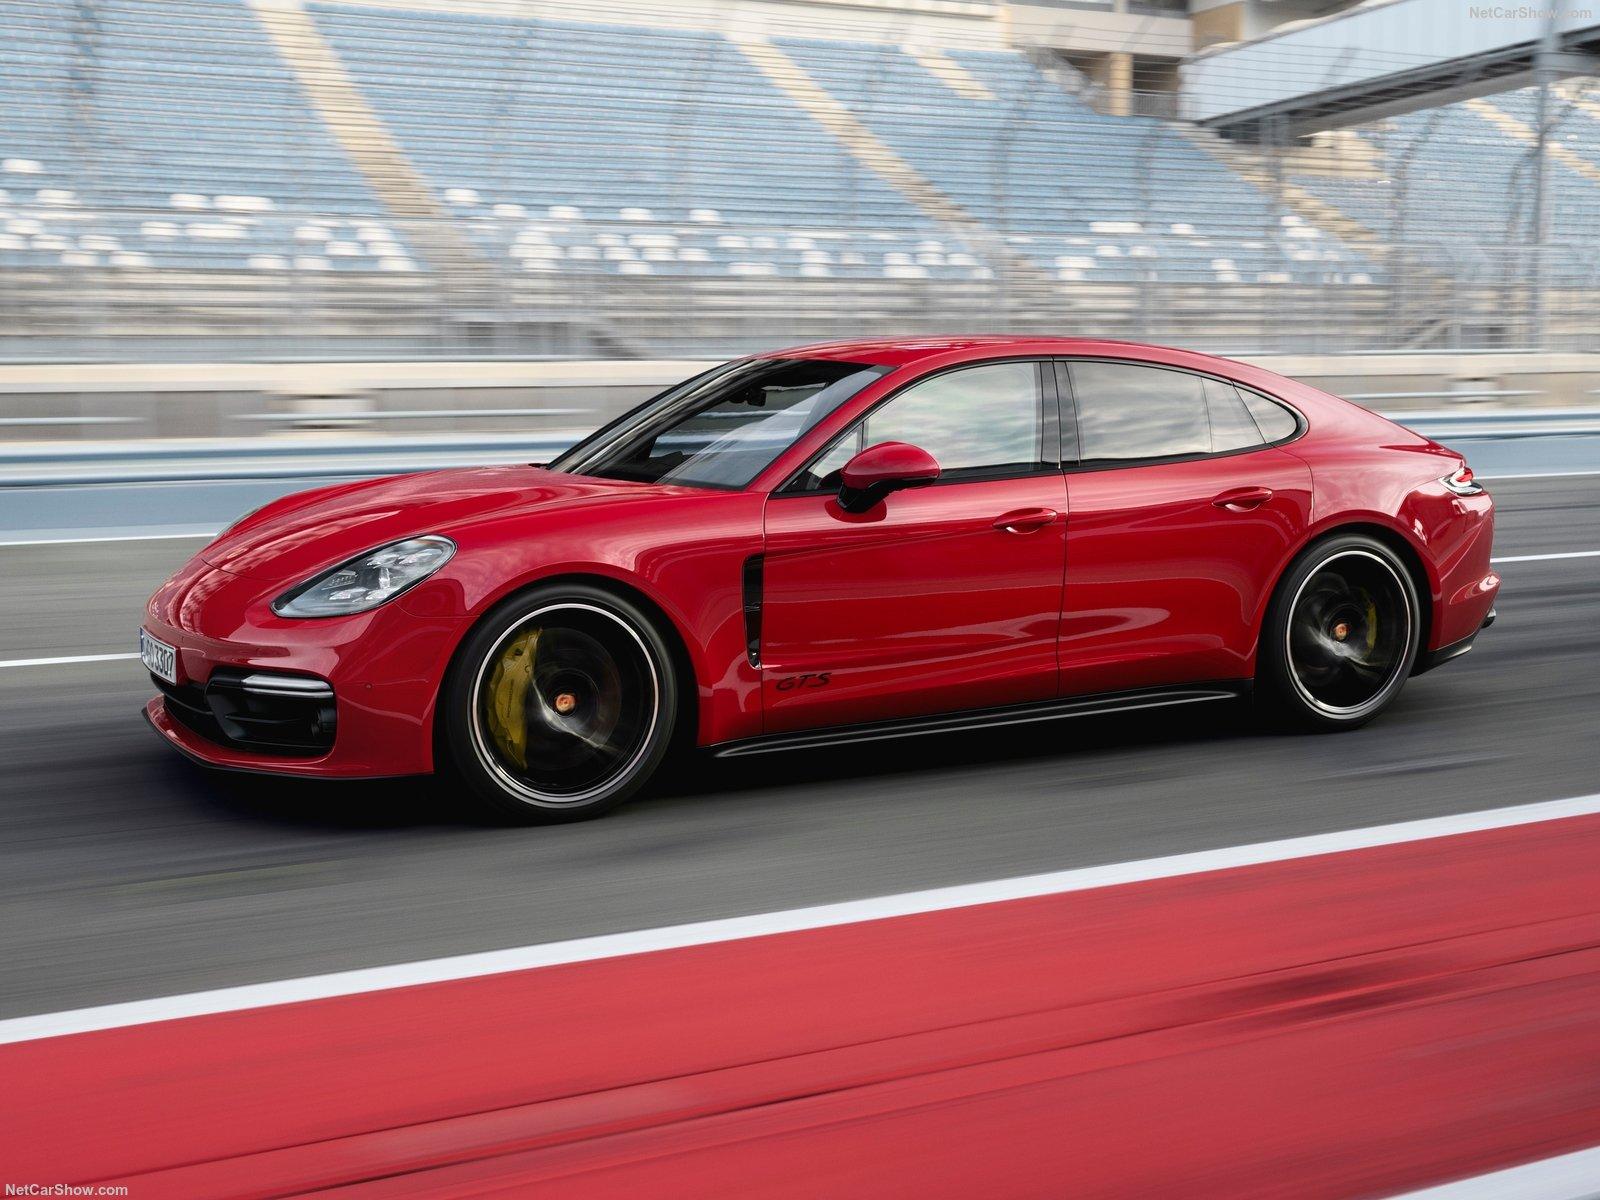 Porsche Panamera Gts 2019 1600 03